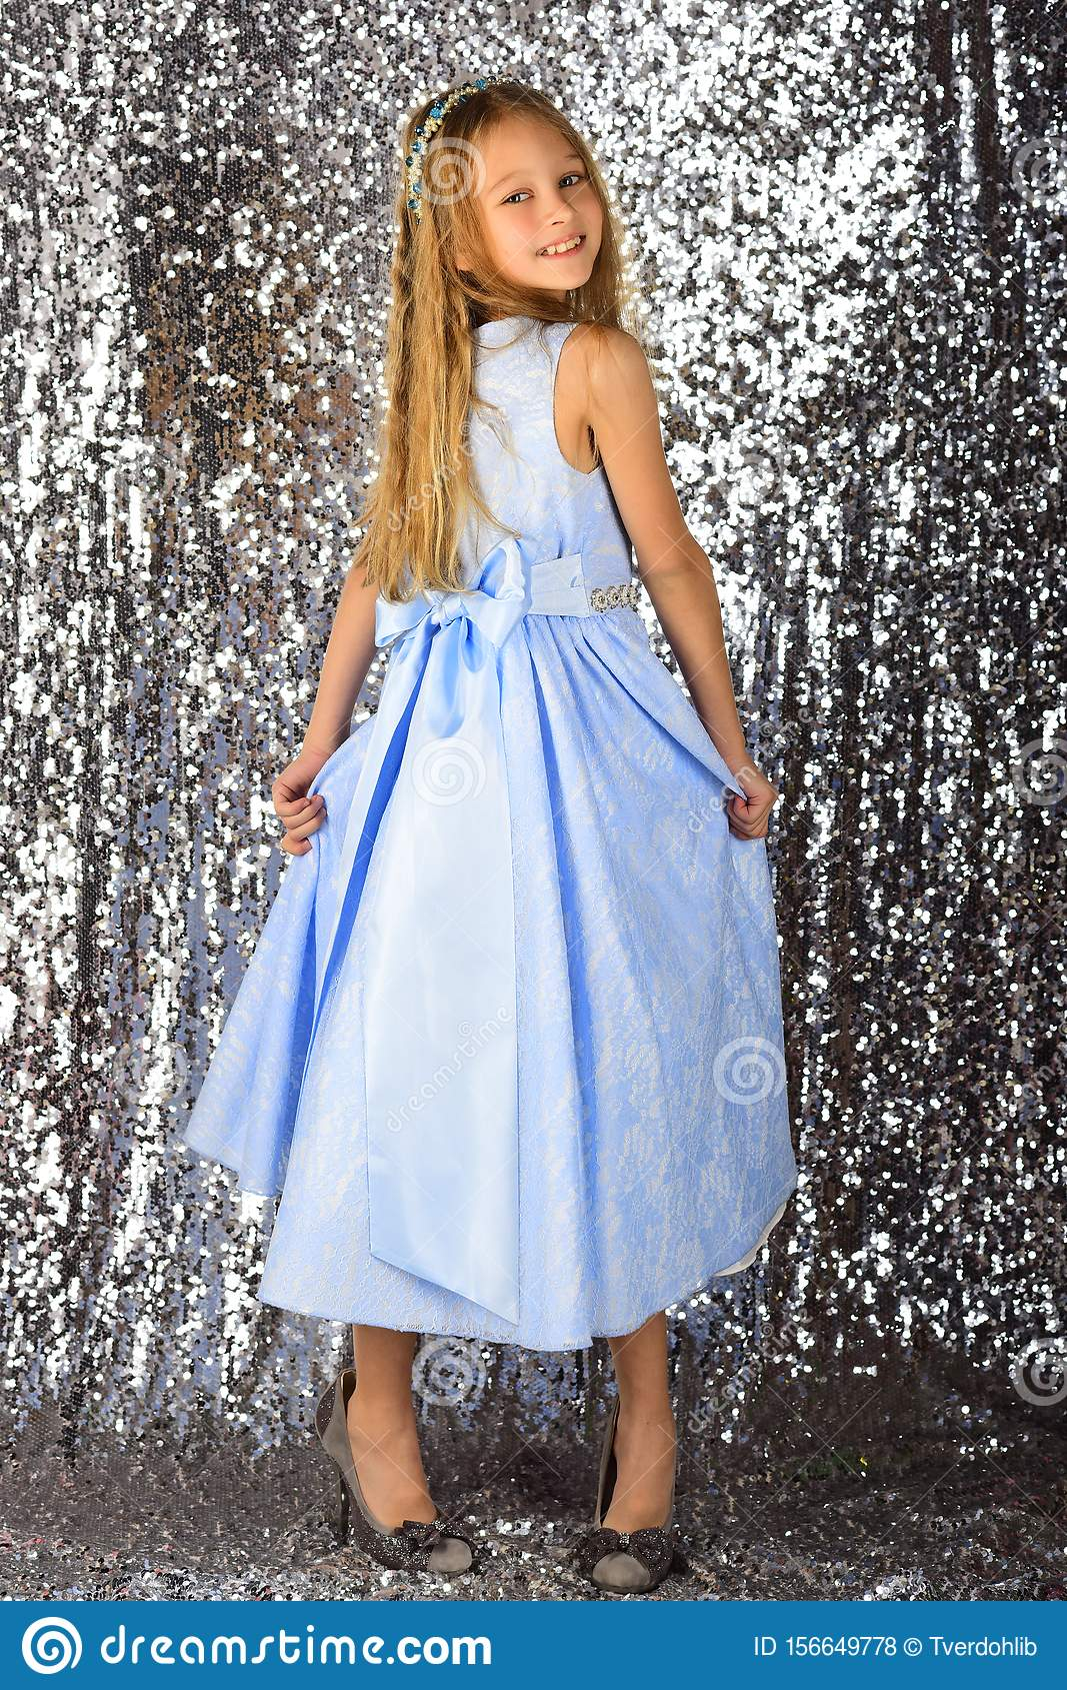 Little girl model, wedding, fashion concept - girl dressed in blue dress smiling